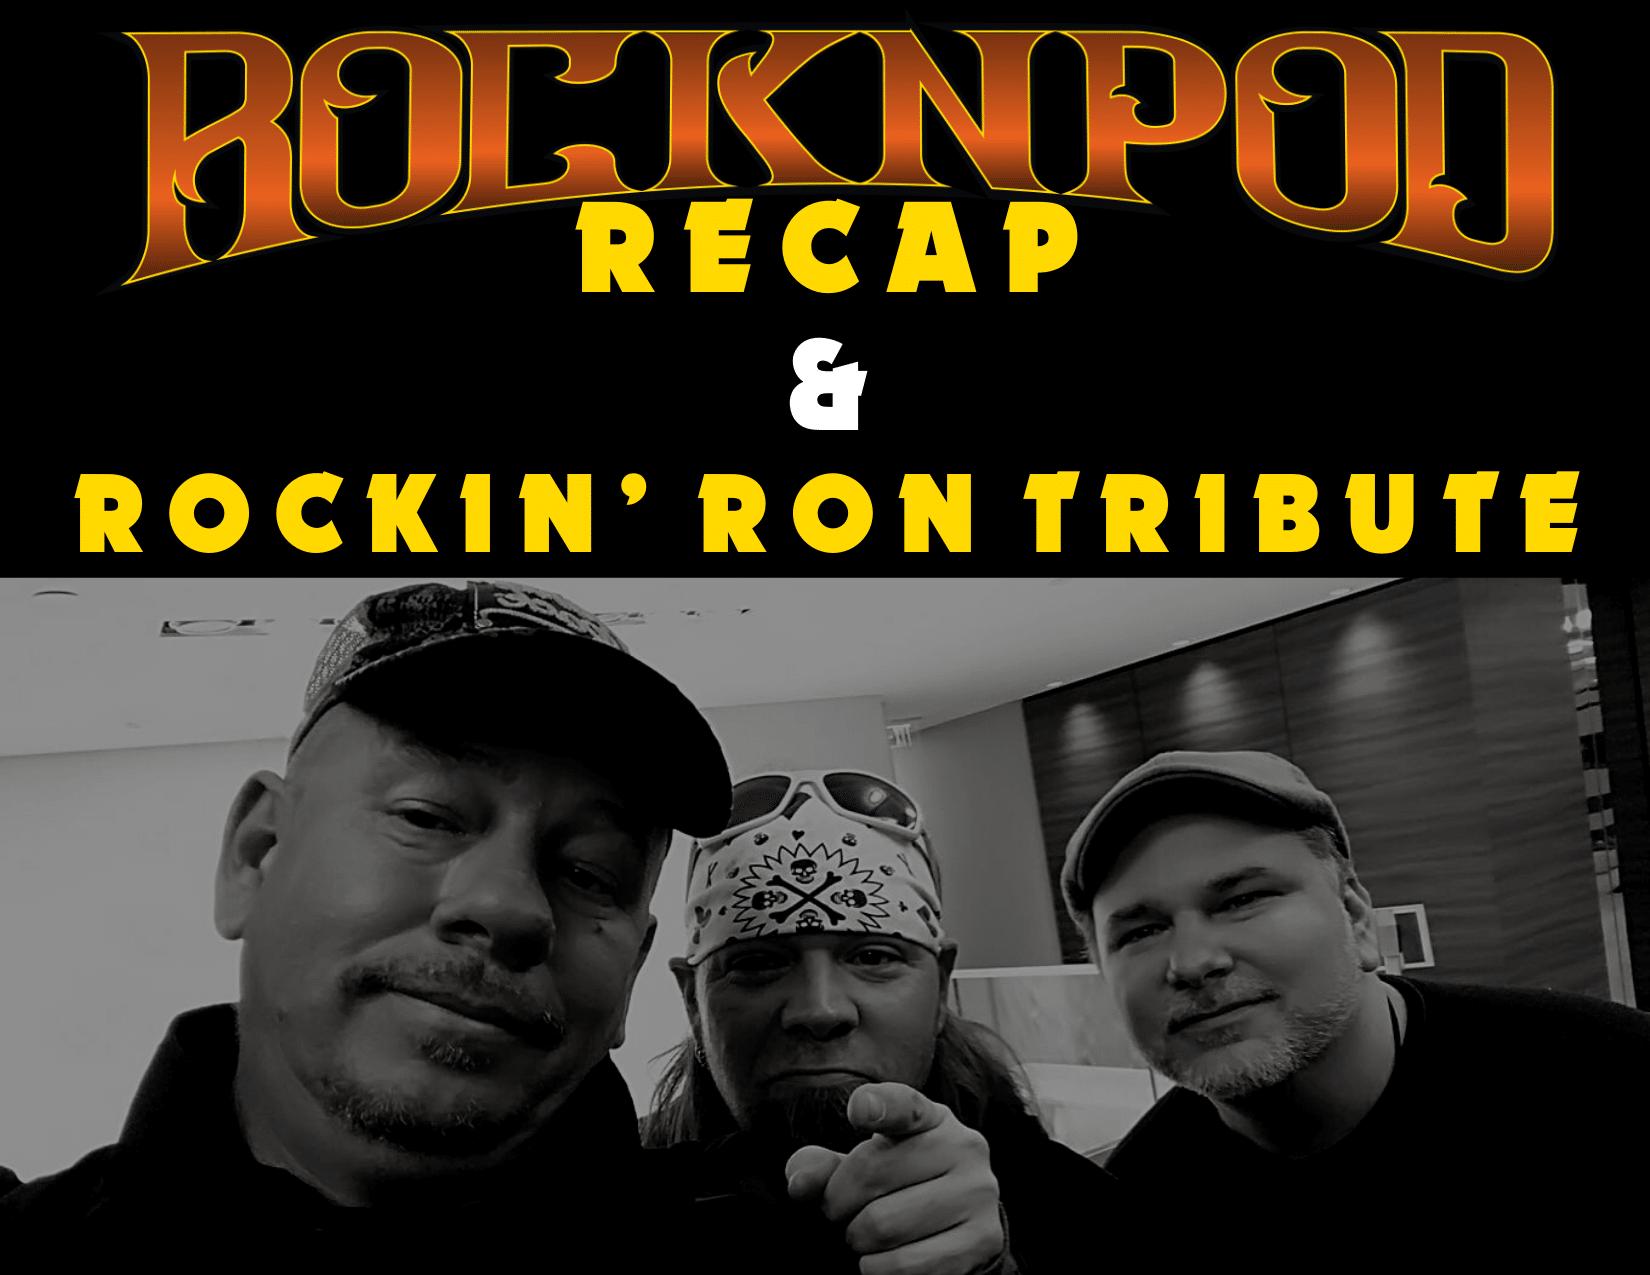 rocknpod recap, rockin' ron tribute, decibel geek podcast